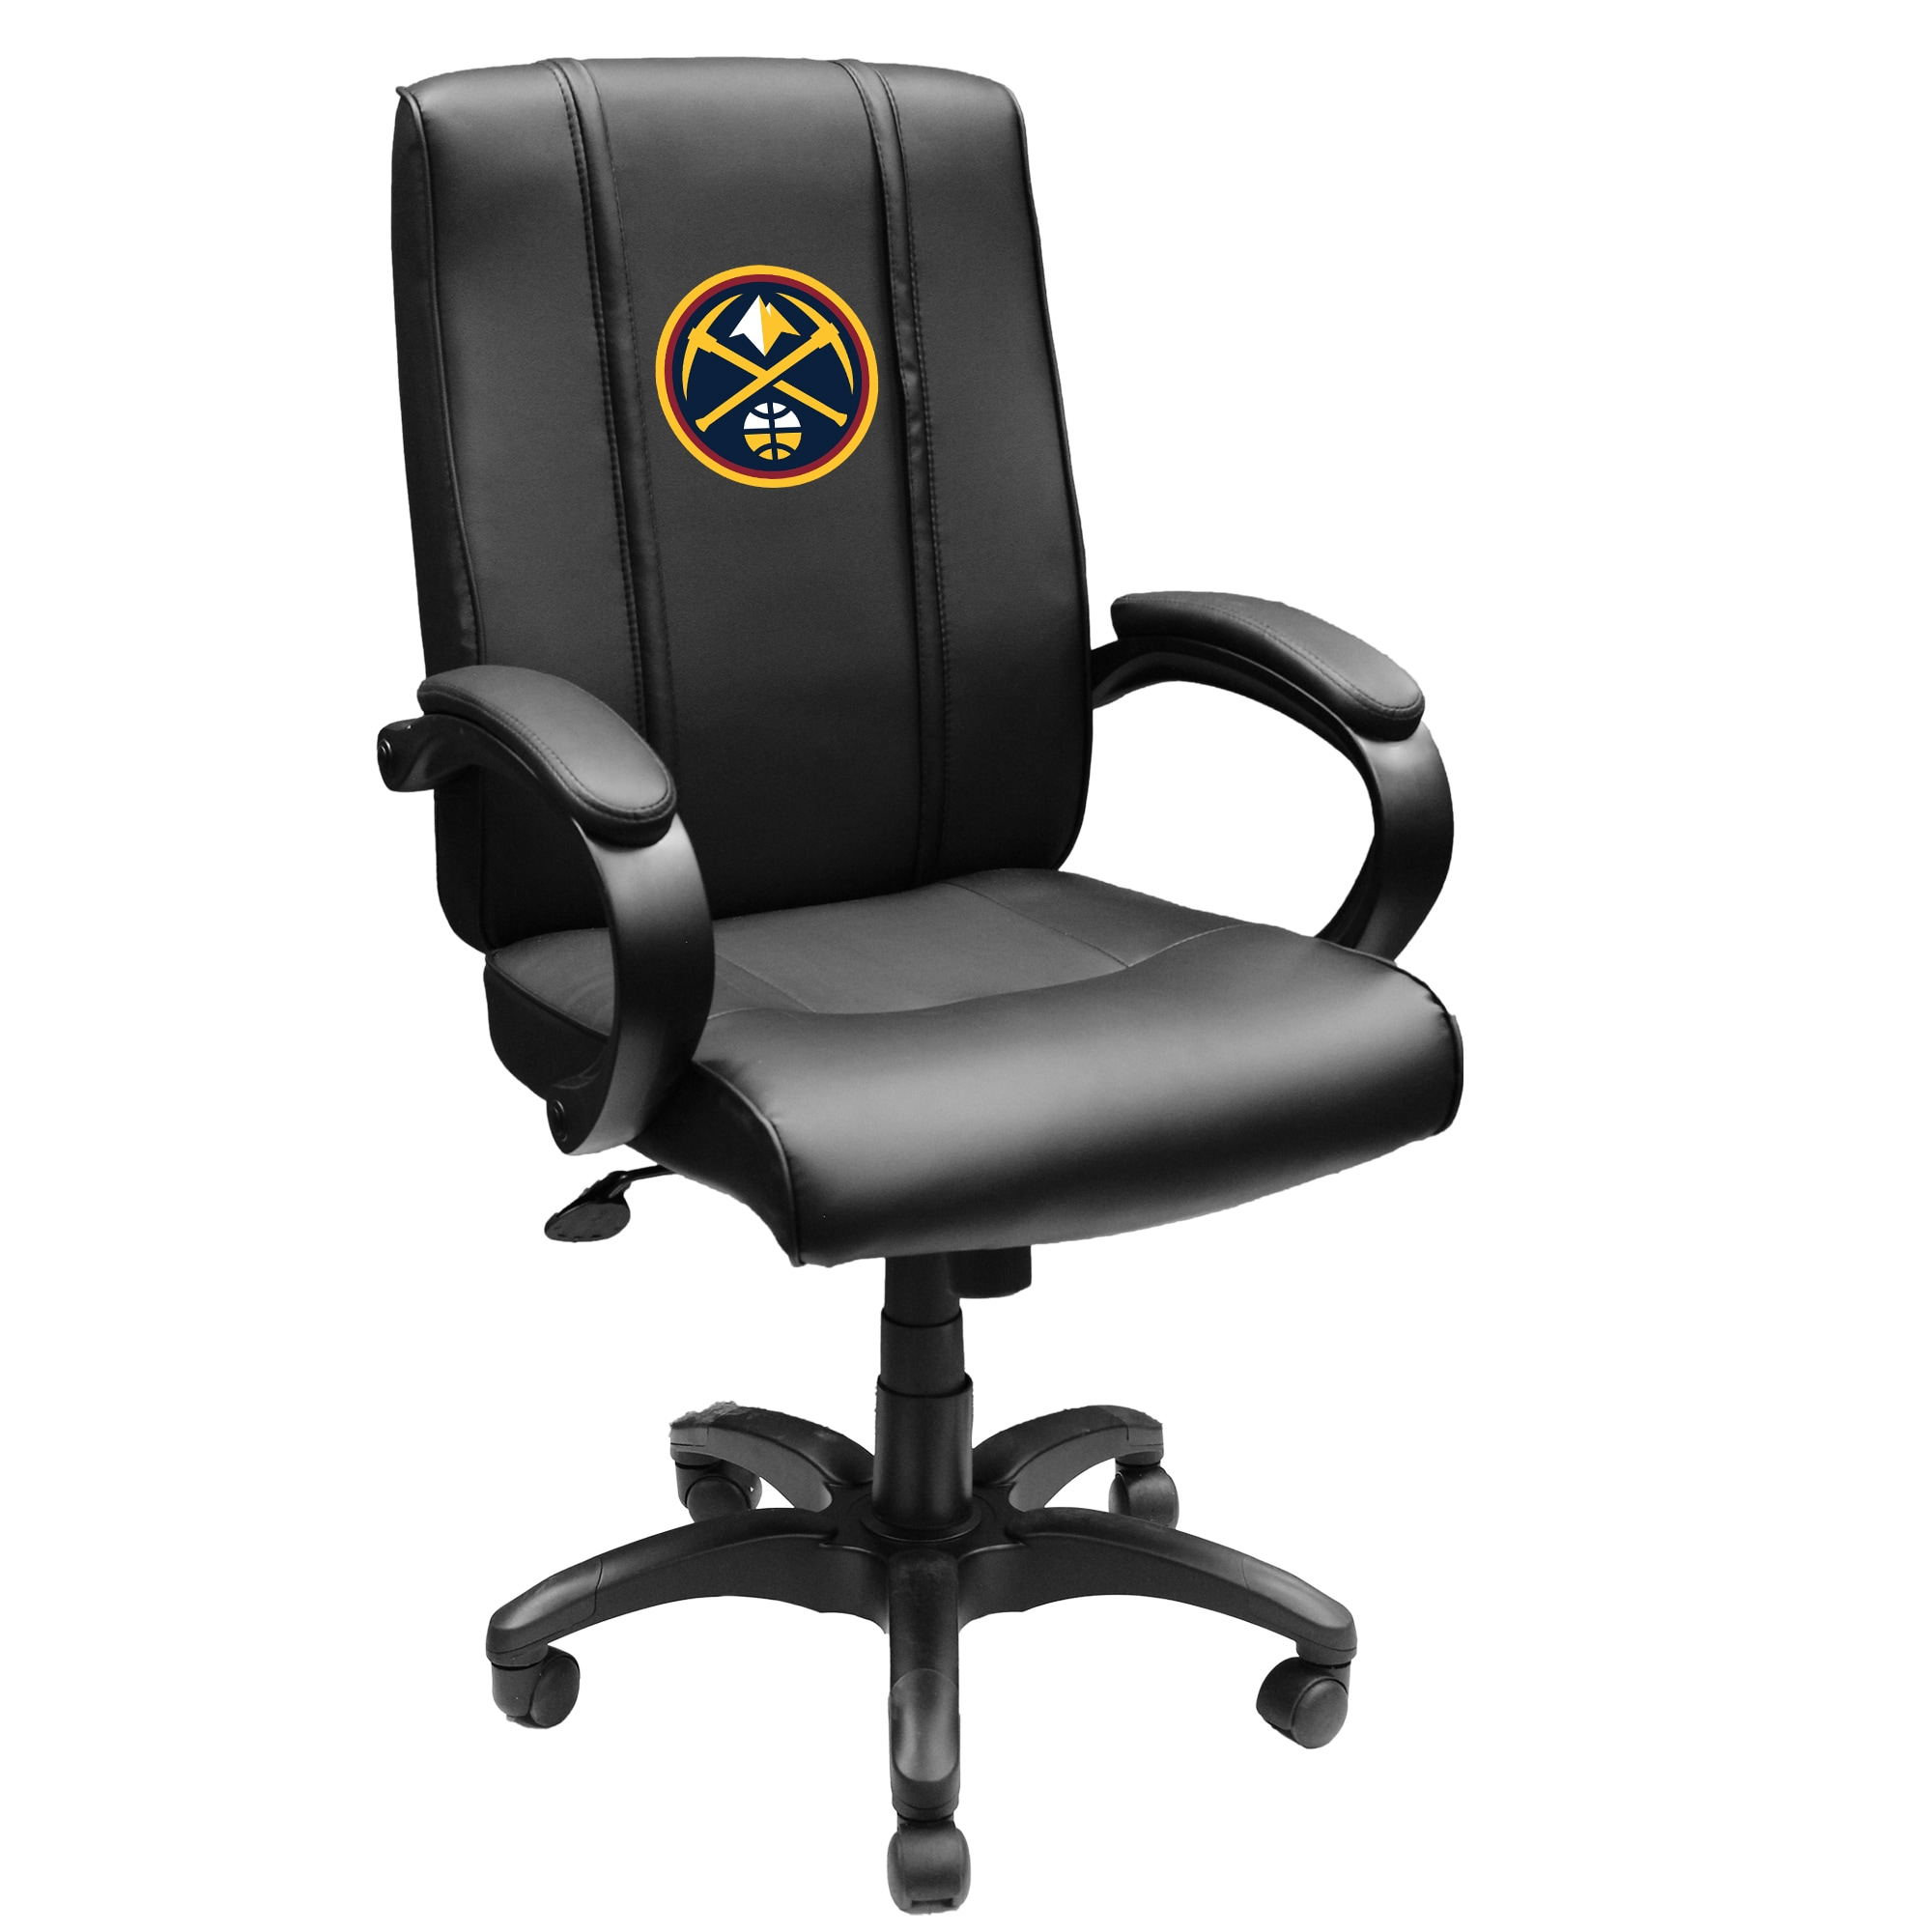 Denver Nuggets DreamSeat Team Office Chair 1000